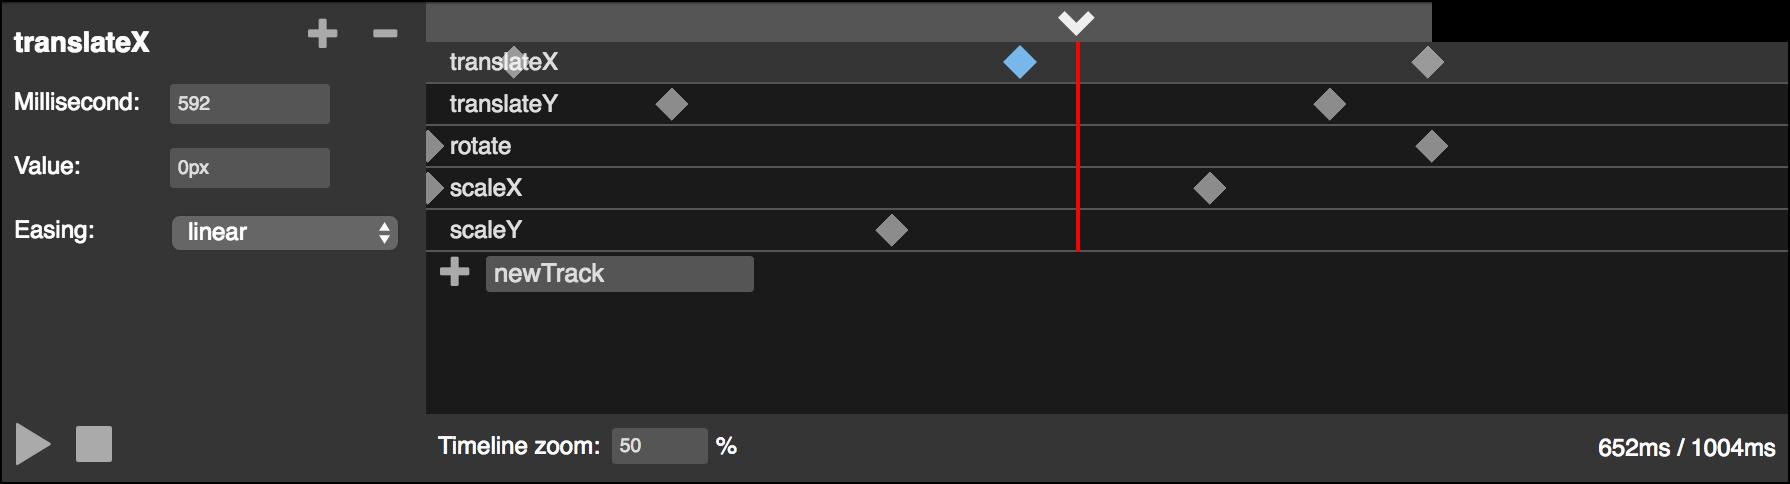 rekapi-timeline screenshot